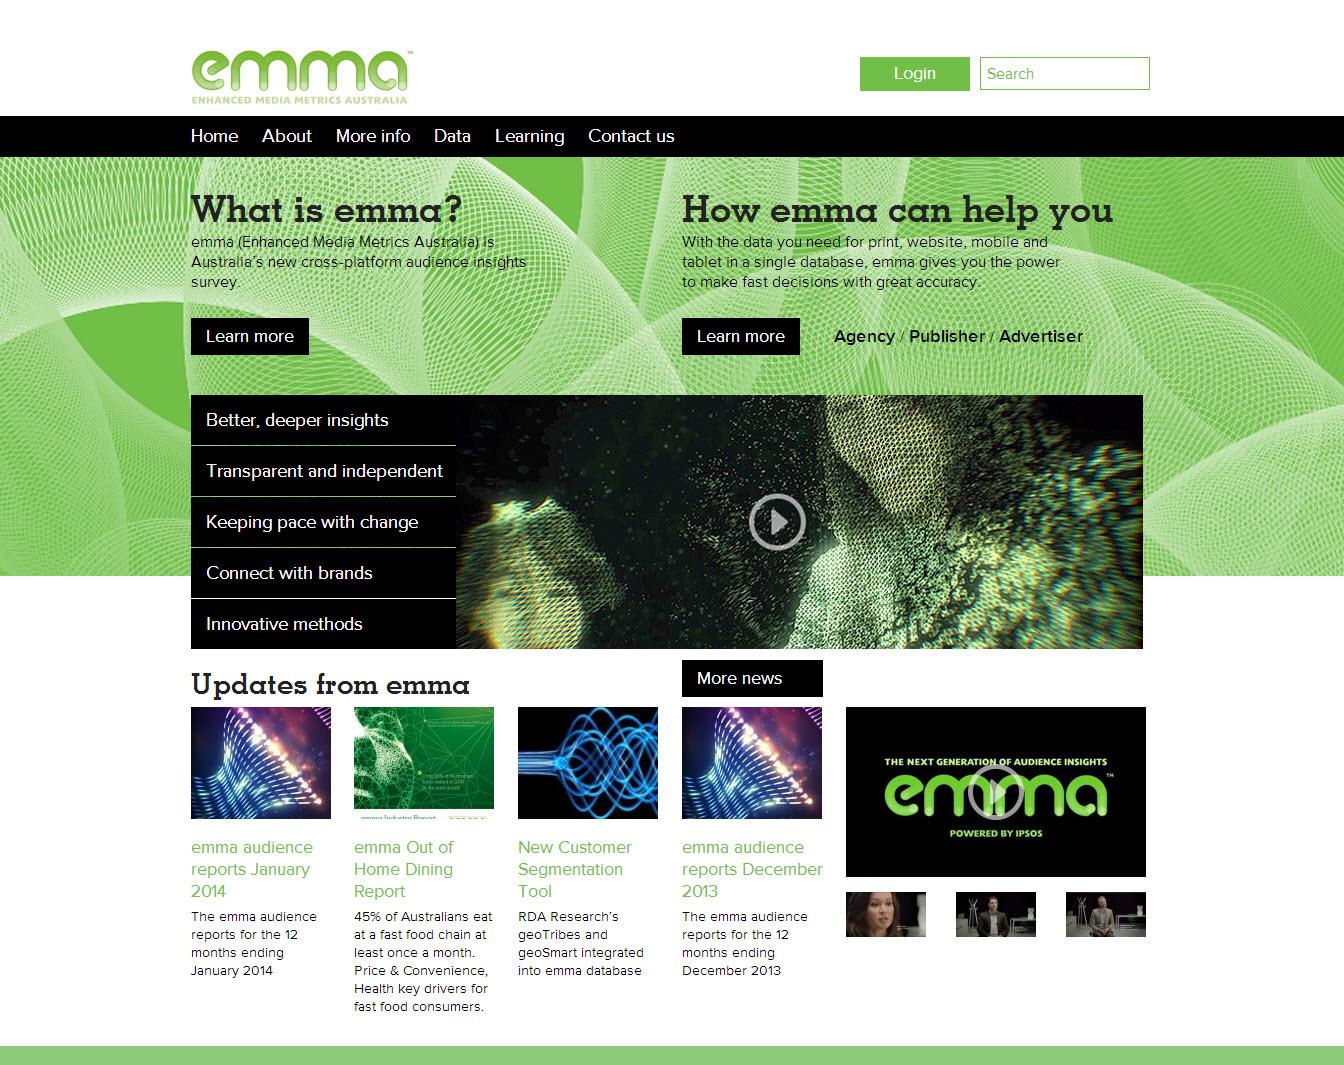 emma-home.jpg